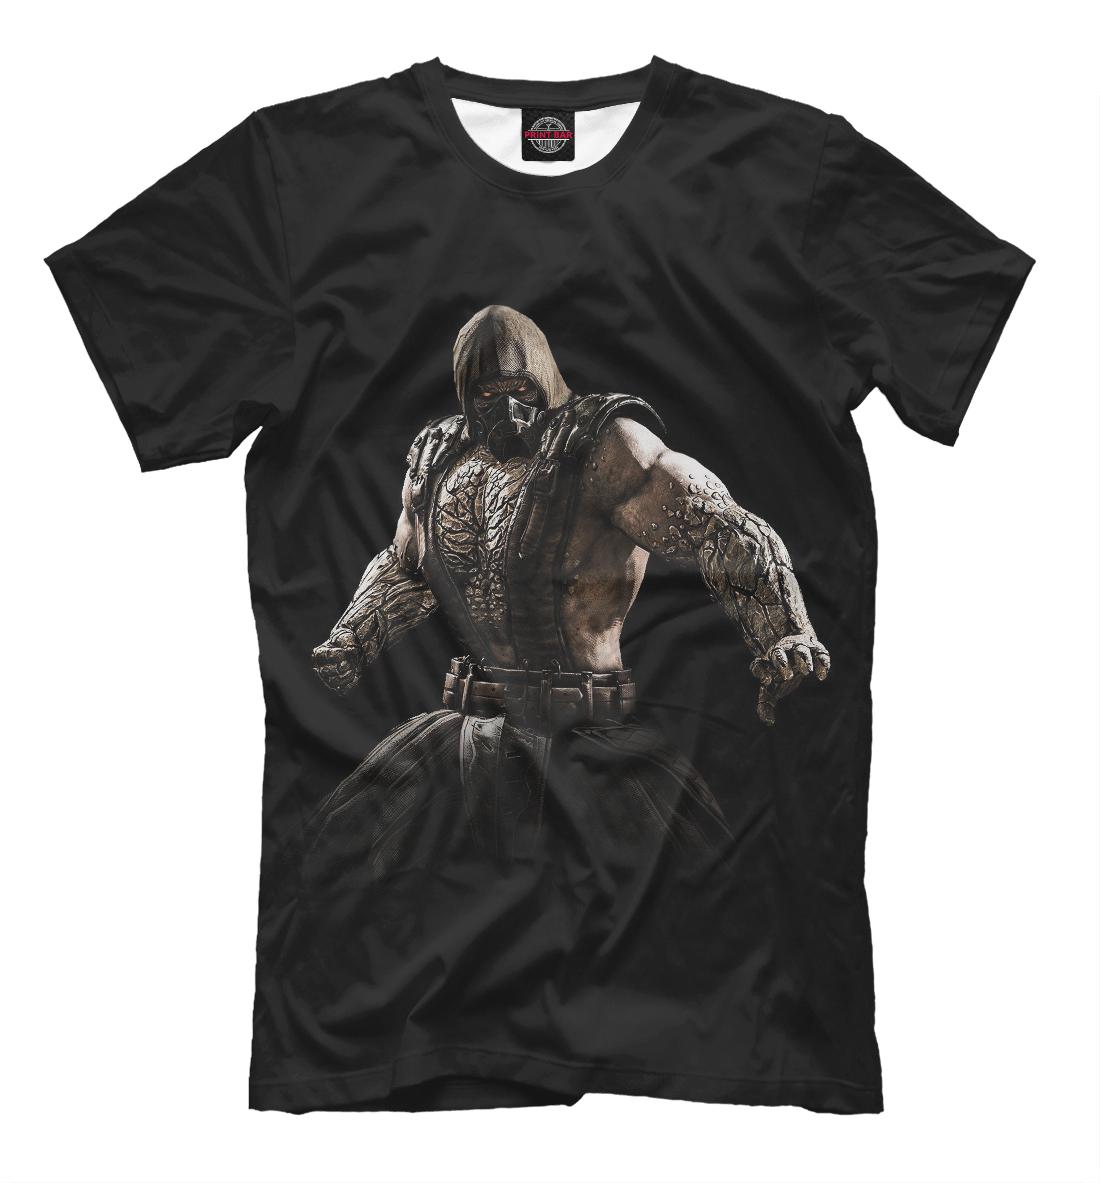 Купить Mortal Kombat, Printbar, Футболки, MKB-555922-fut-2